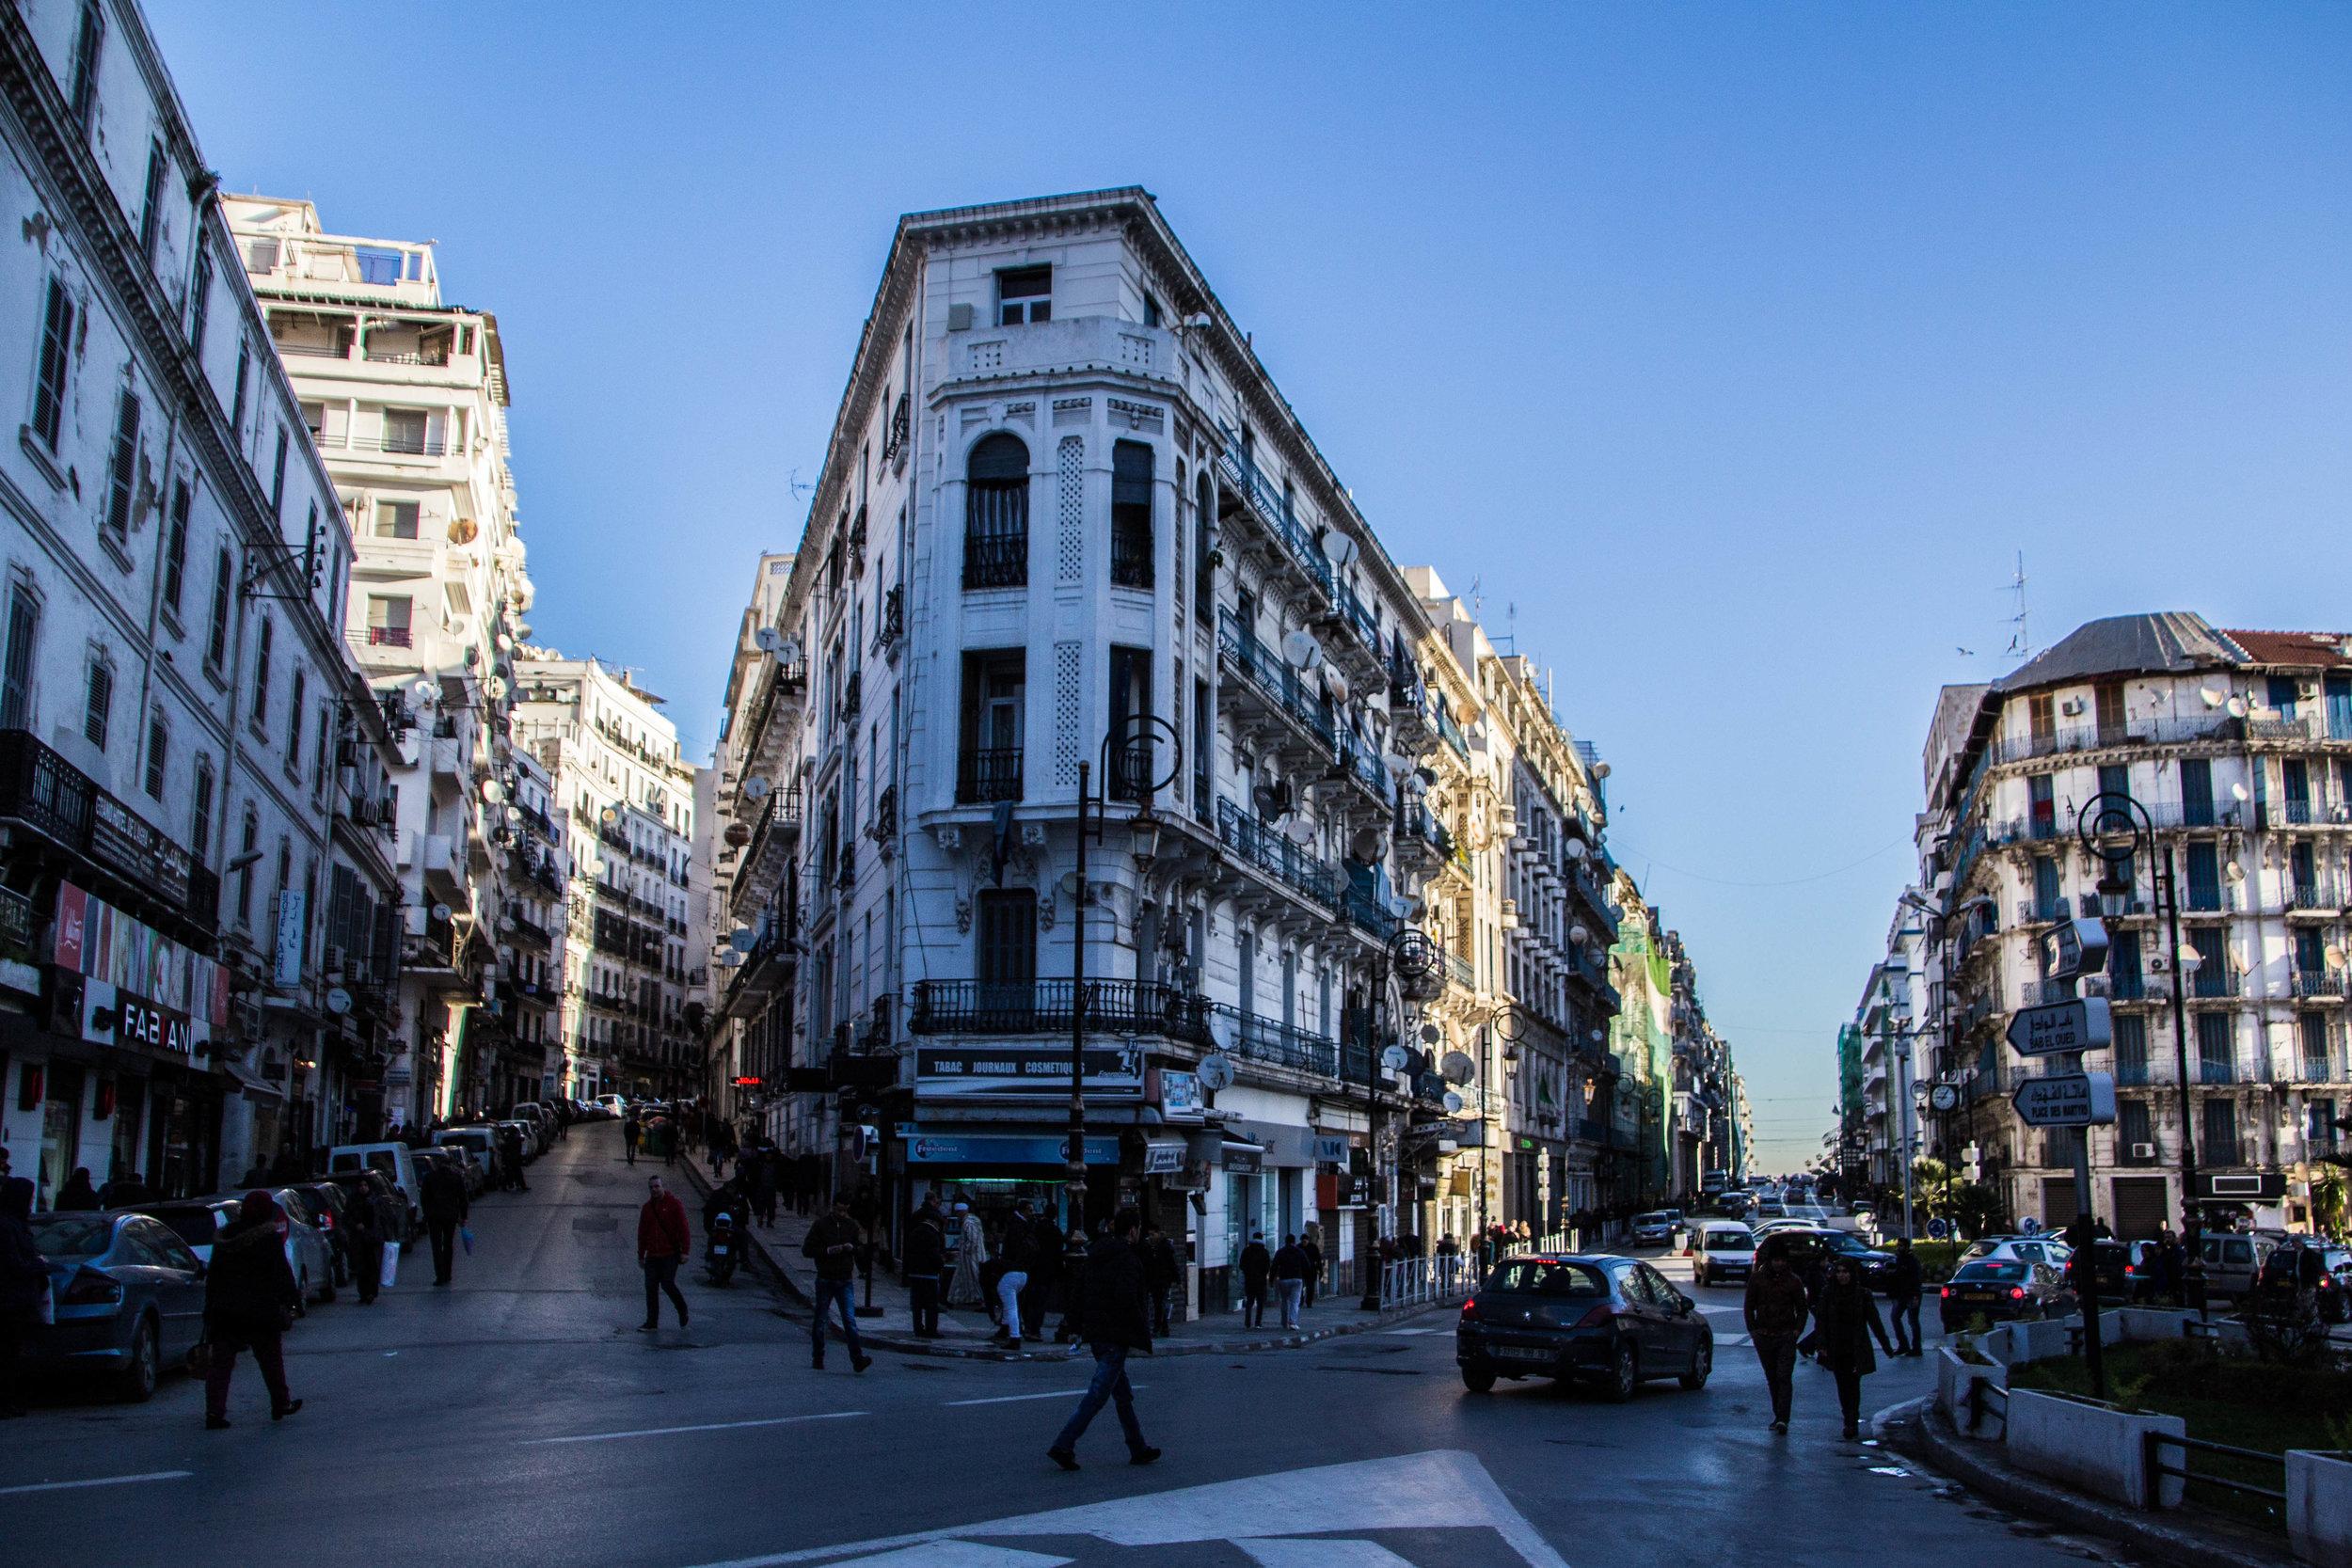 street-photography-algiers-algeria-9.jpg